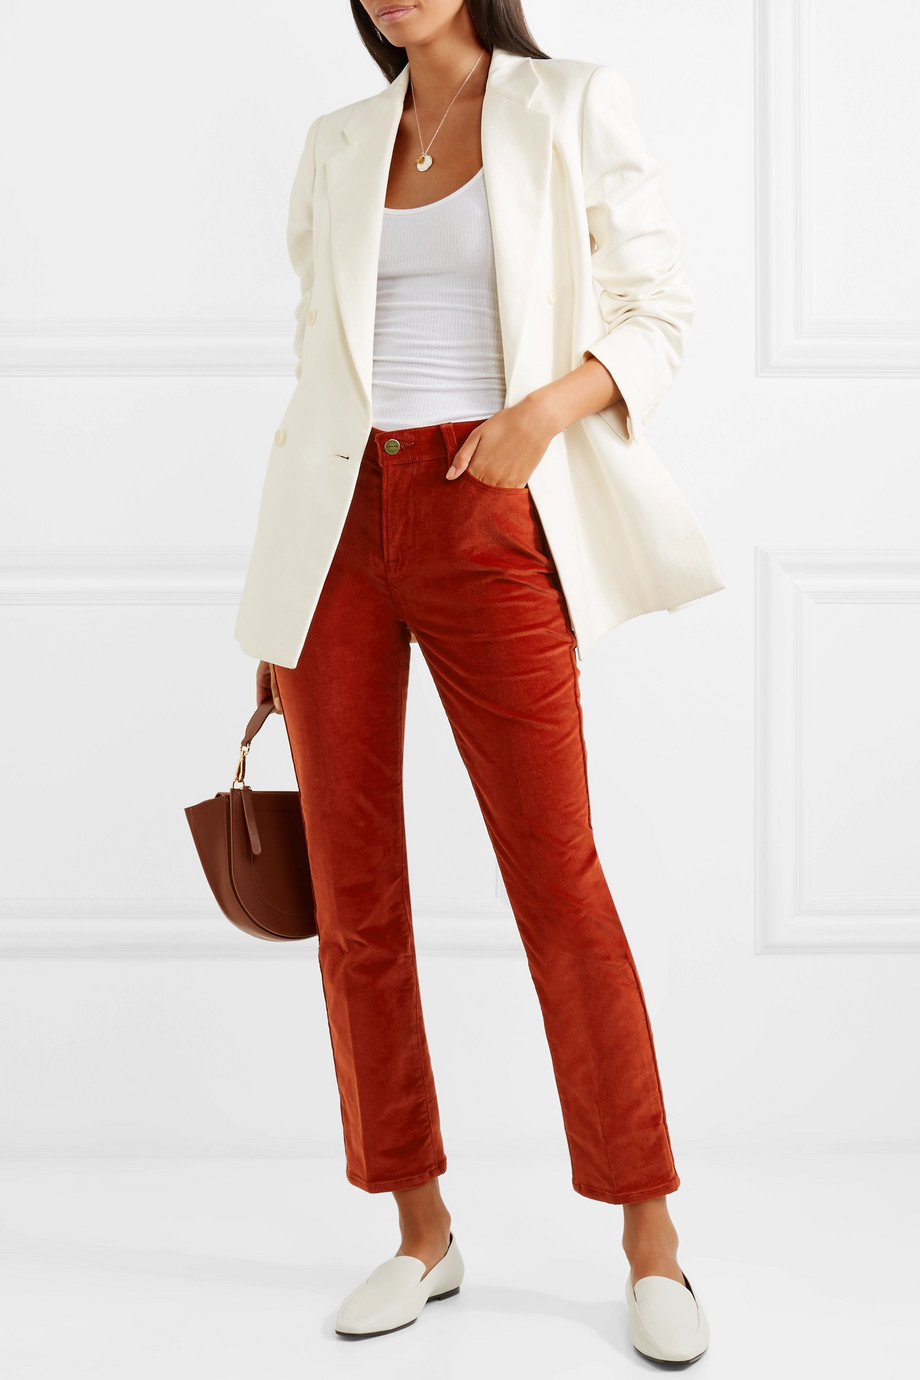 Frame Le High cotton-blend corduroy straight-leg pants $195